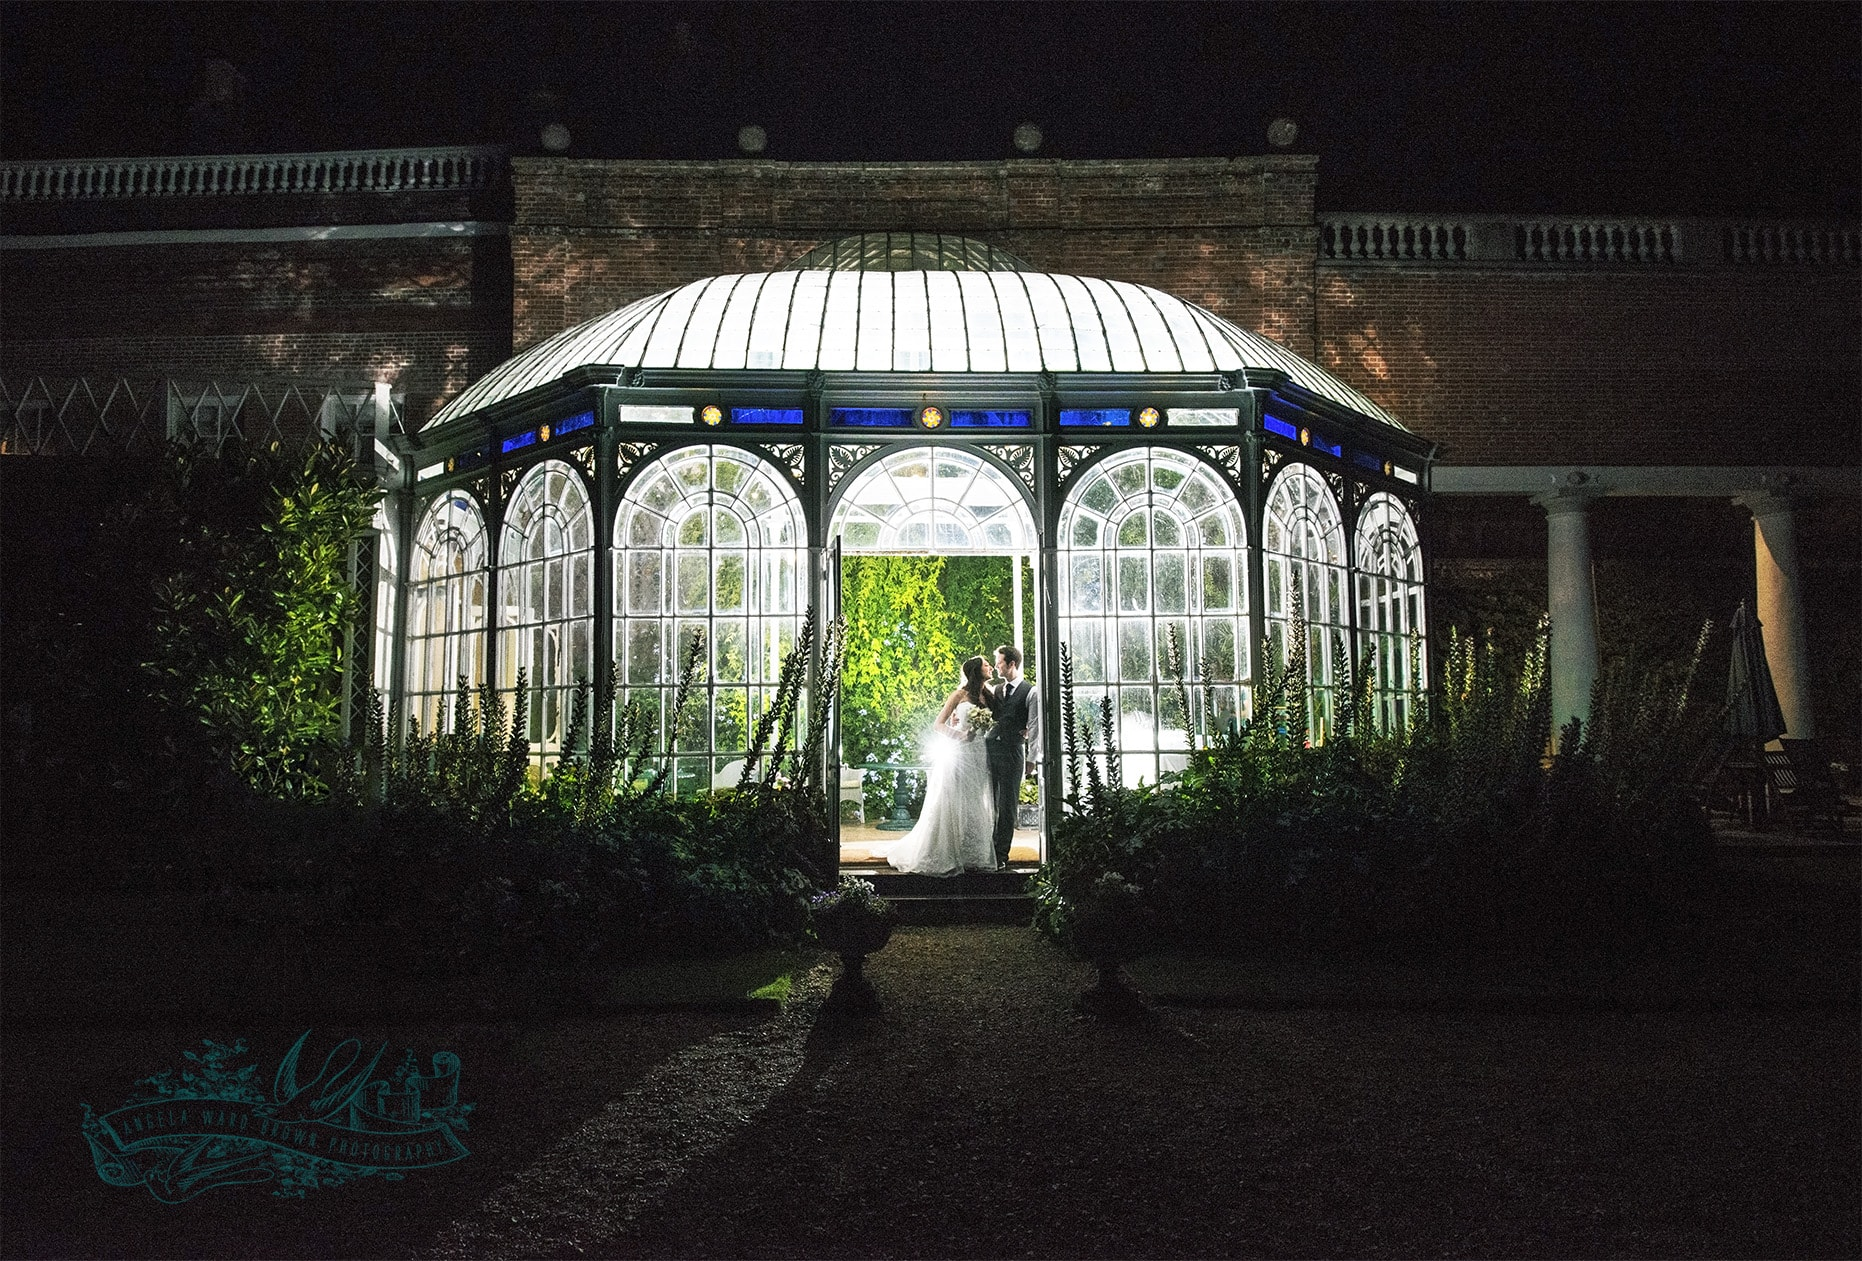 avinton park wedding photography